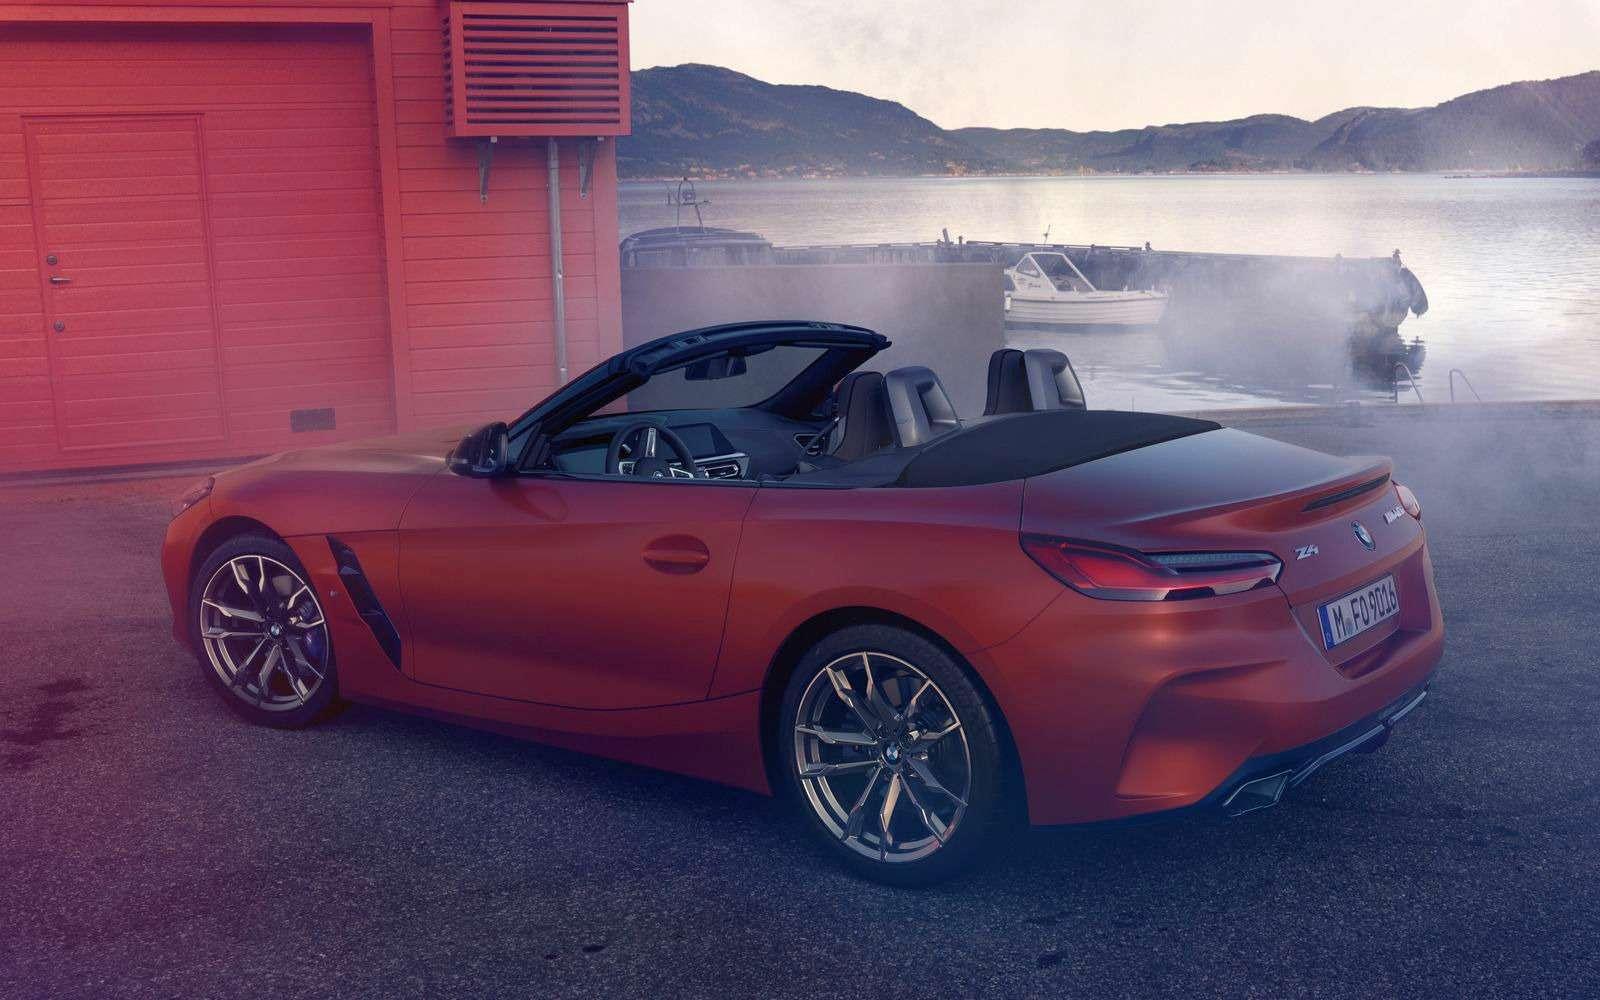 Новый родстер BMW Z4представлен официально— фото 898541